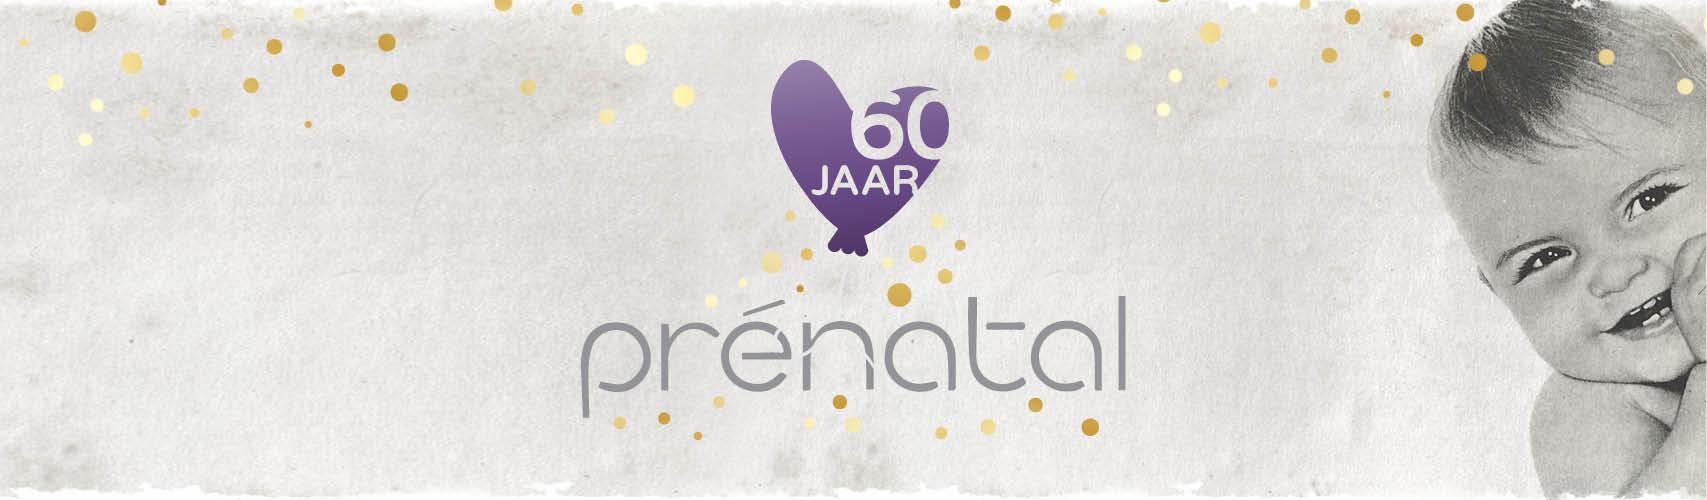 prenatal 60 jaar